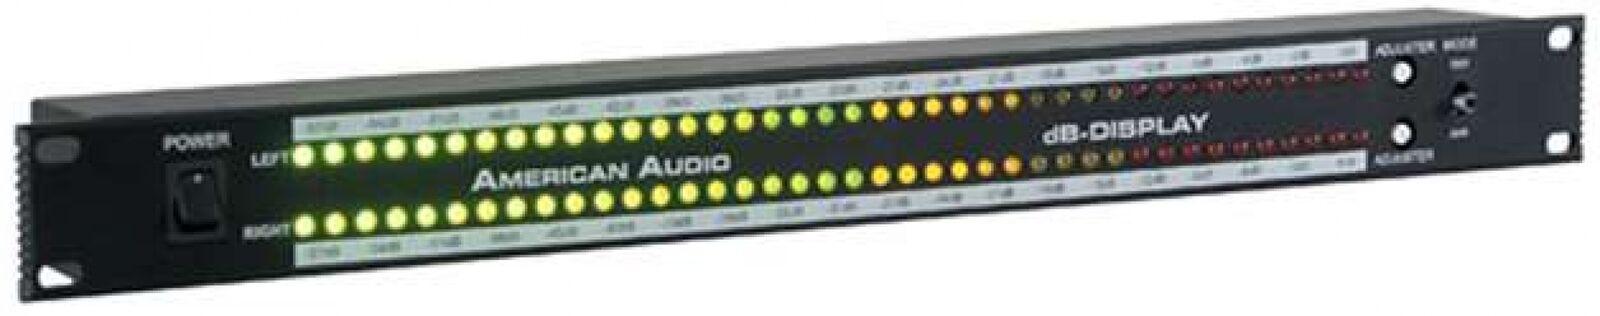 American Audio DB Display 19-Inch Decibel LED